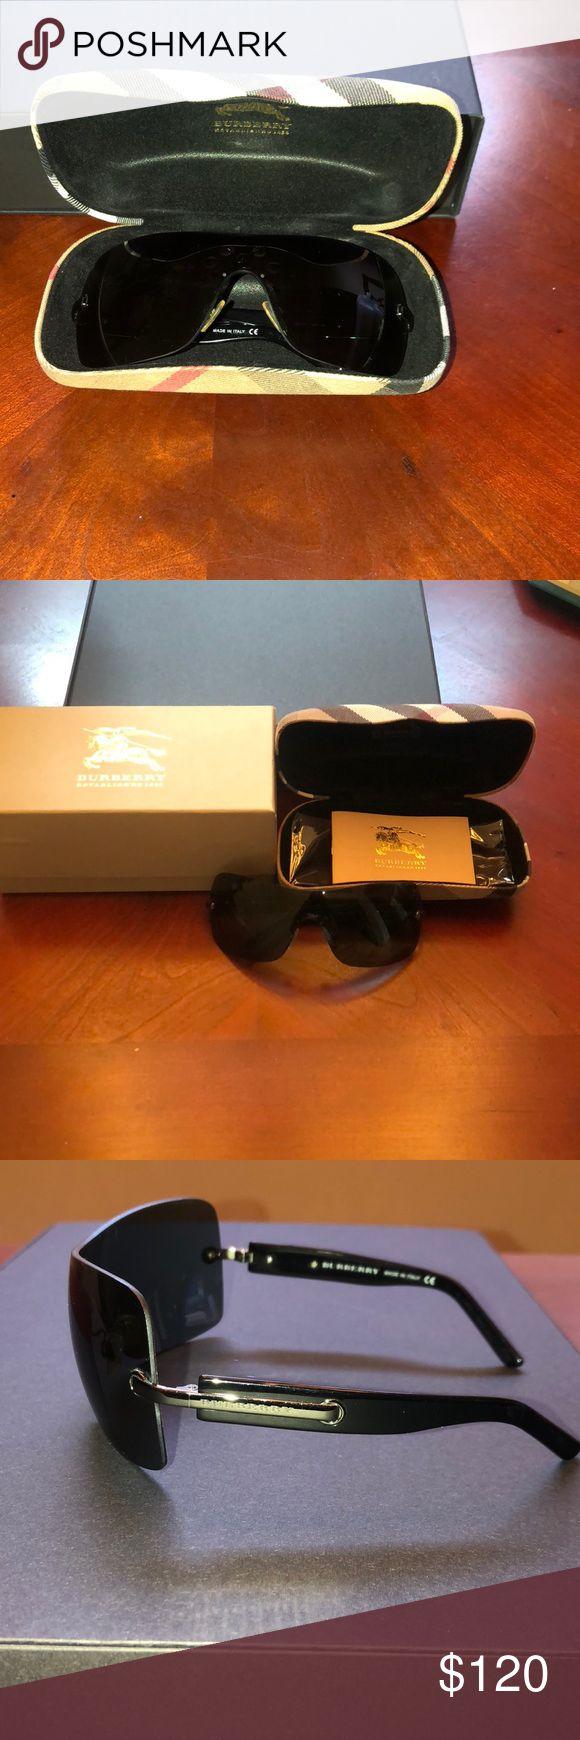 Burberry sunglasses EUC Authentic Burberry Sunglasses Black comes with case and box Burberry Accessories Sunglasses